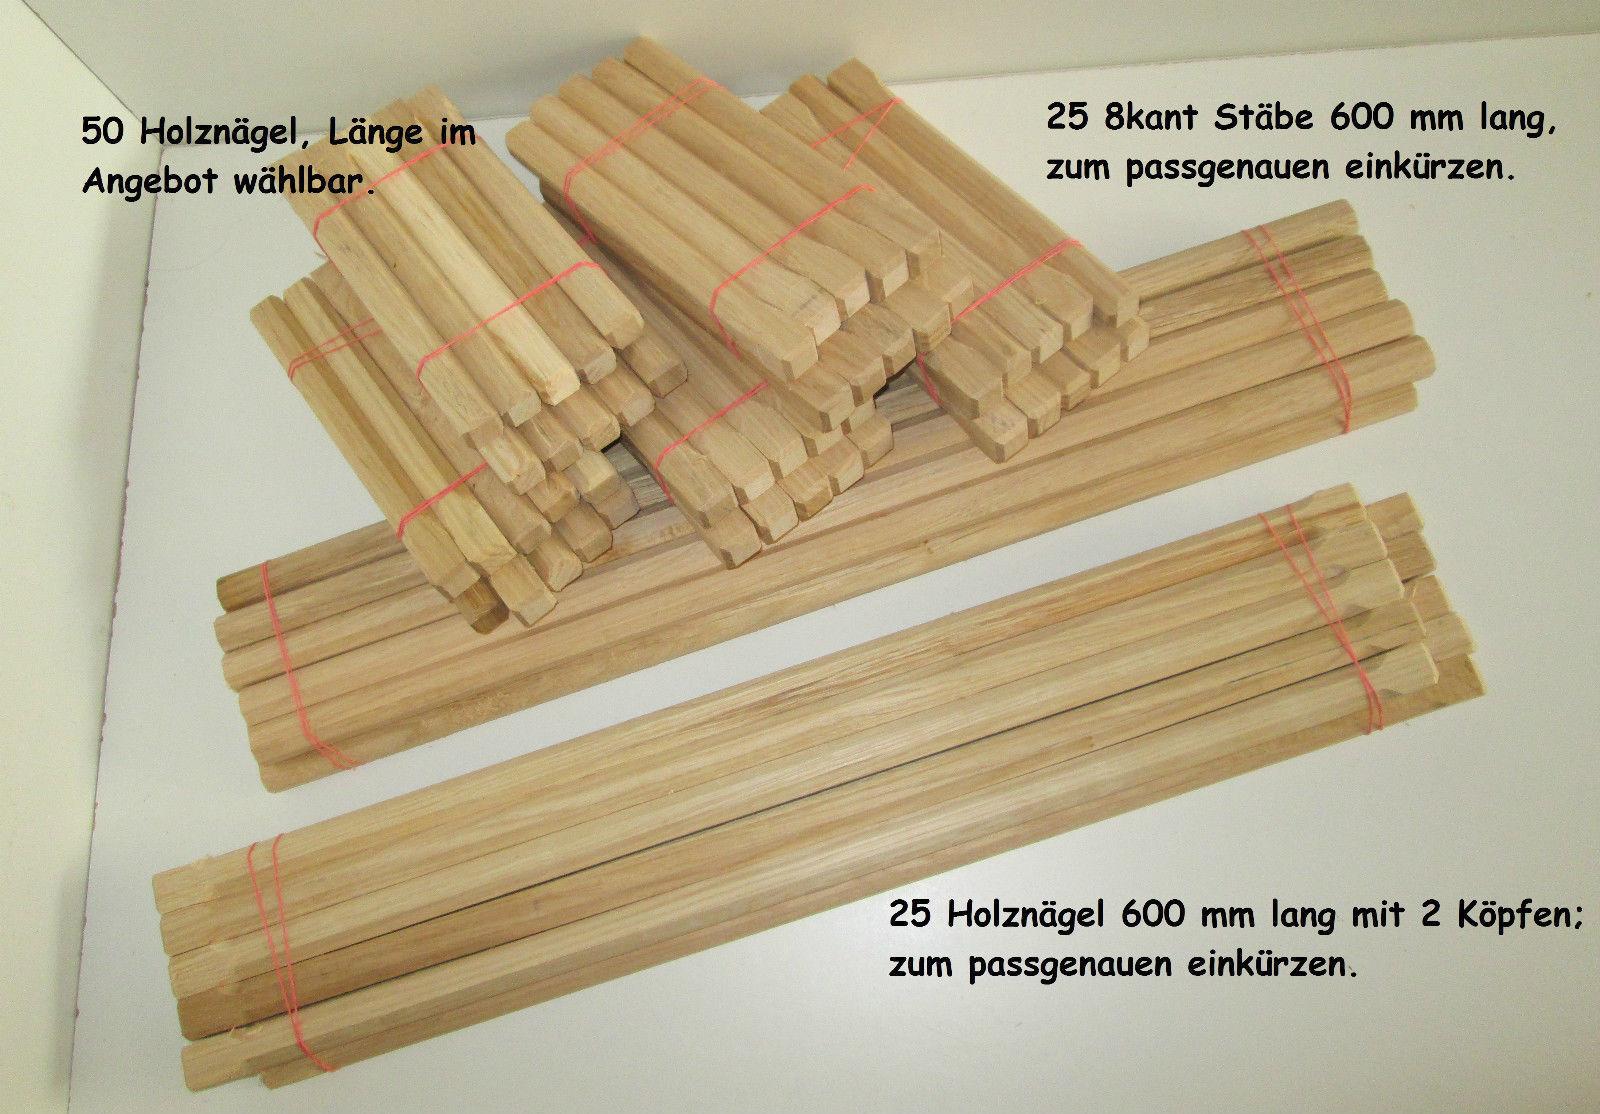 50/25 Stück Holznagel Fachwerknägel Holznägel aus Eiche Länge 120-600 mm x 20 mm